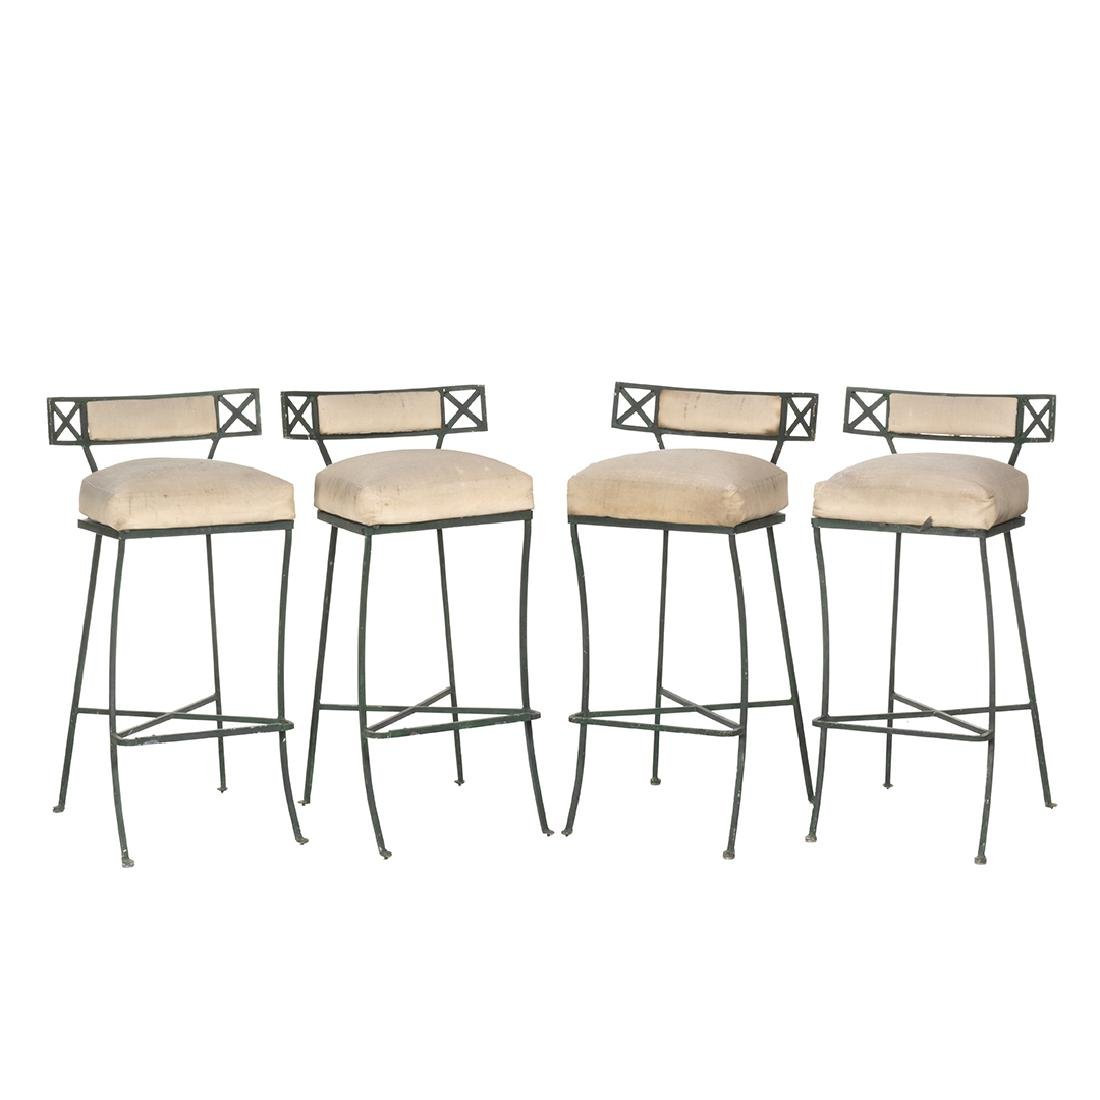 Tommi Parzinger Style Bar Stools (4)